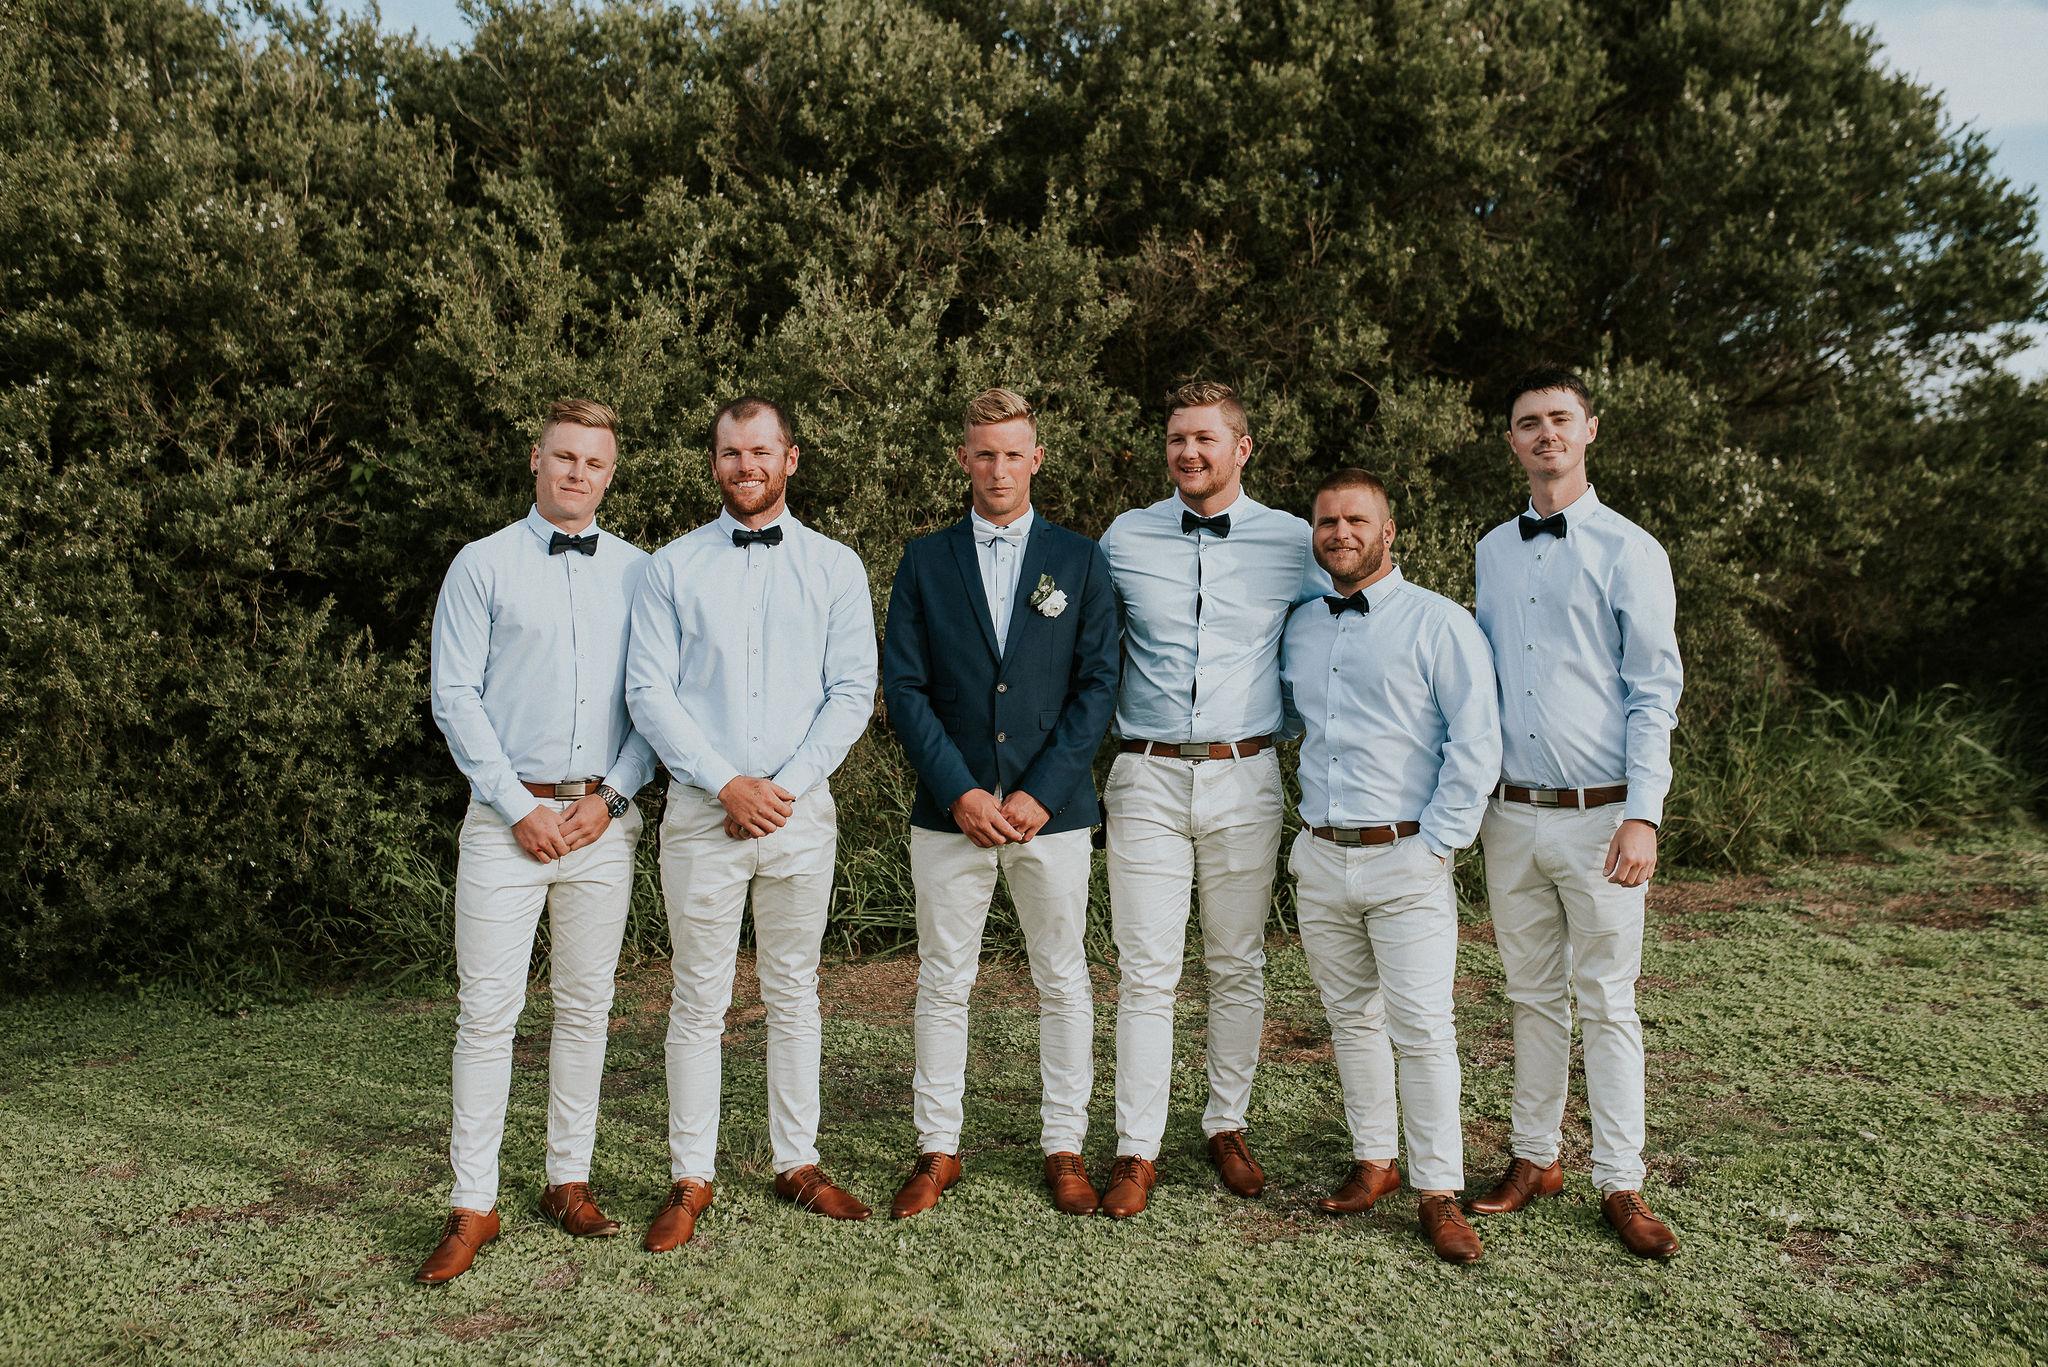 CAVES-BEACH-HOTEL-WEDDING-PATTEN-1022.jpg